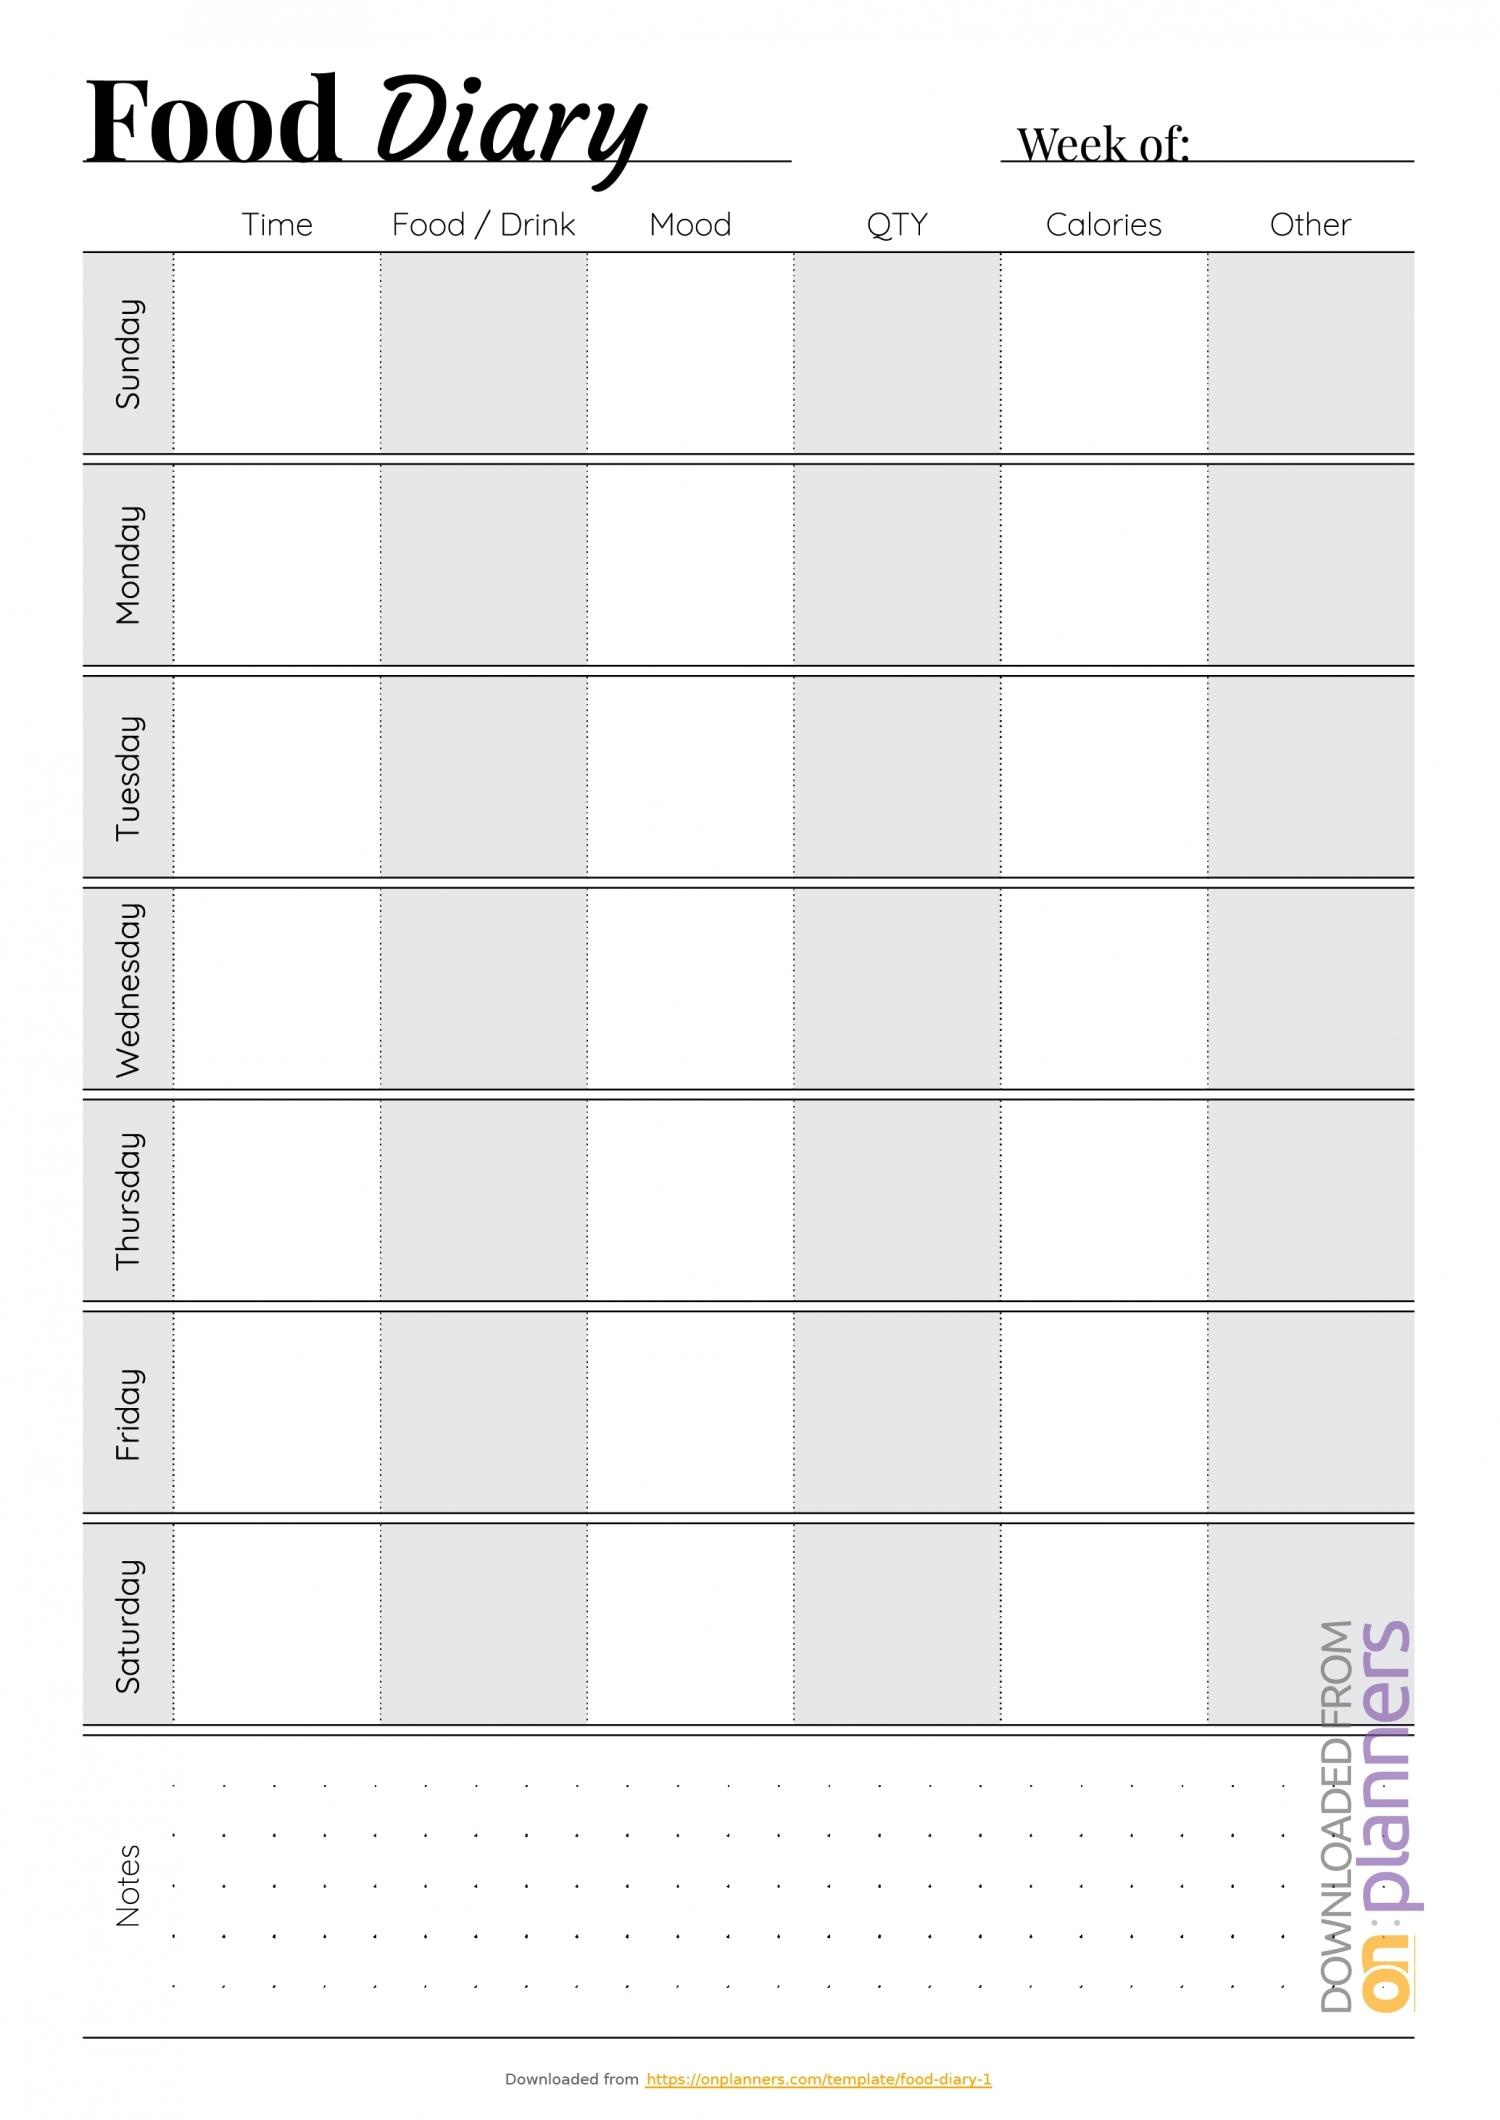 Monday Through Friday Calendar Pdf | Ten Free Printable Monday-Friday Calandar With Lines Printable